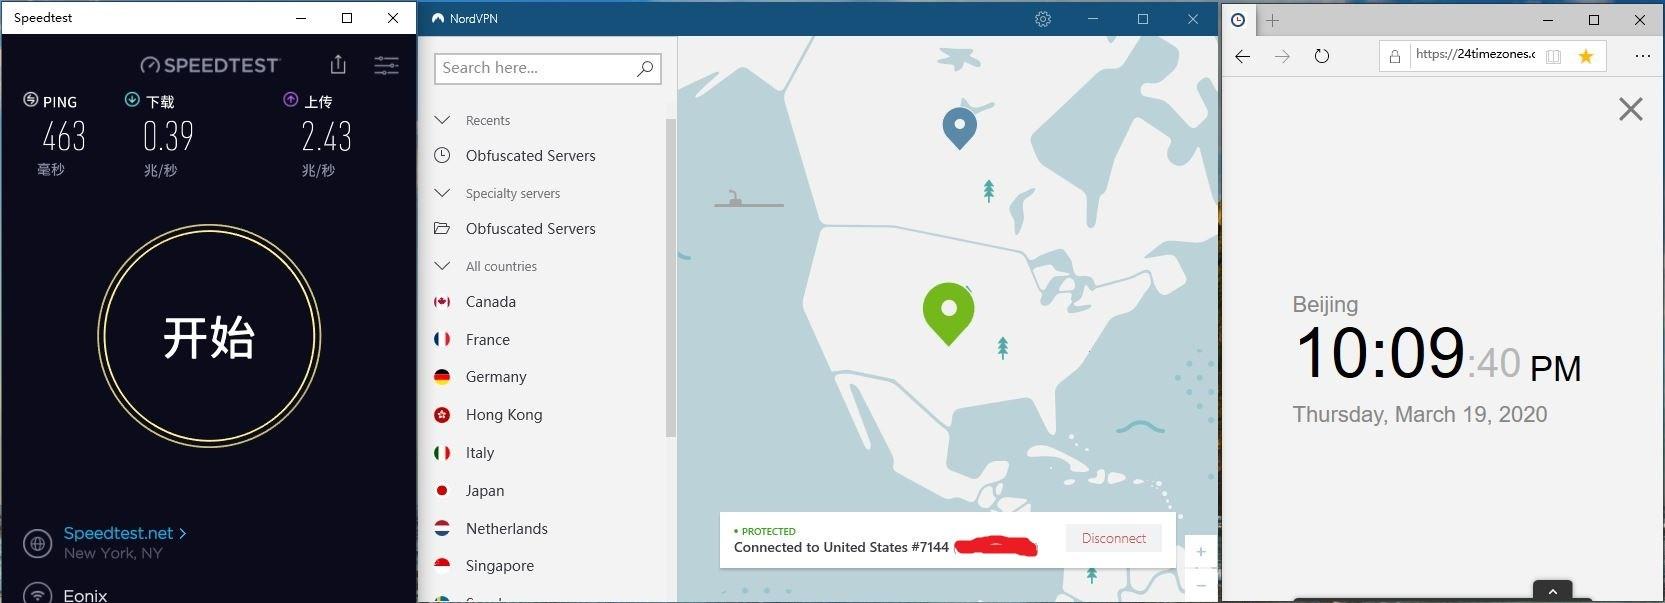 Windows10-NordVPN-USA-7144-中国VPN翻墙-科学上网-Youtube测速-20200319.jpg